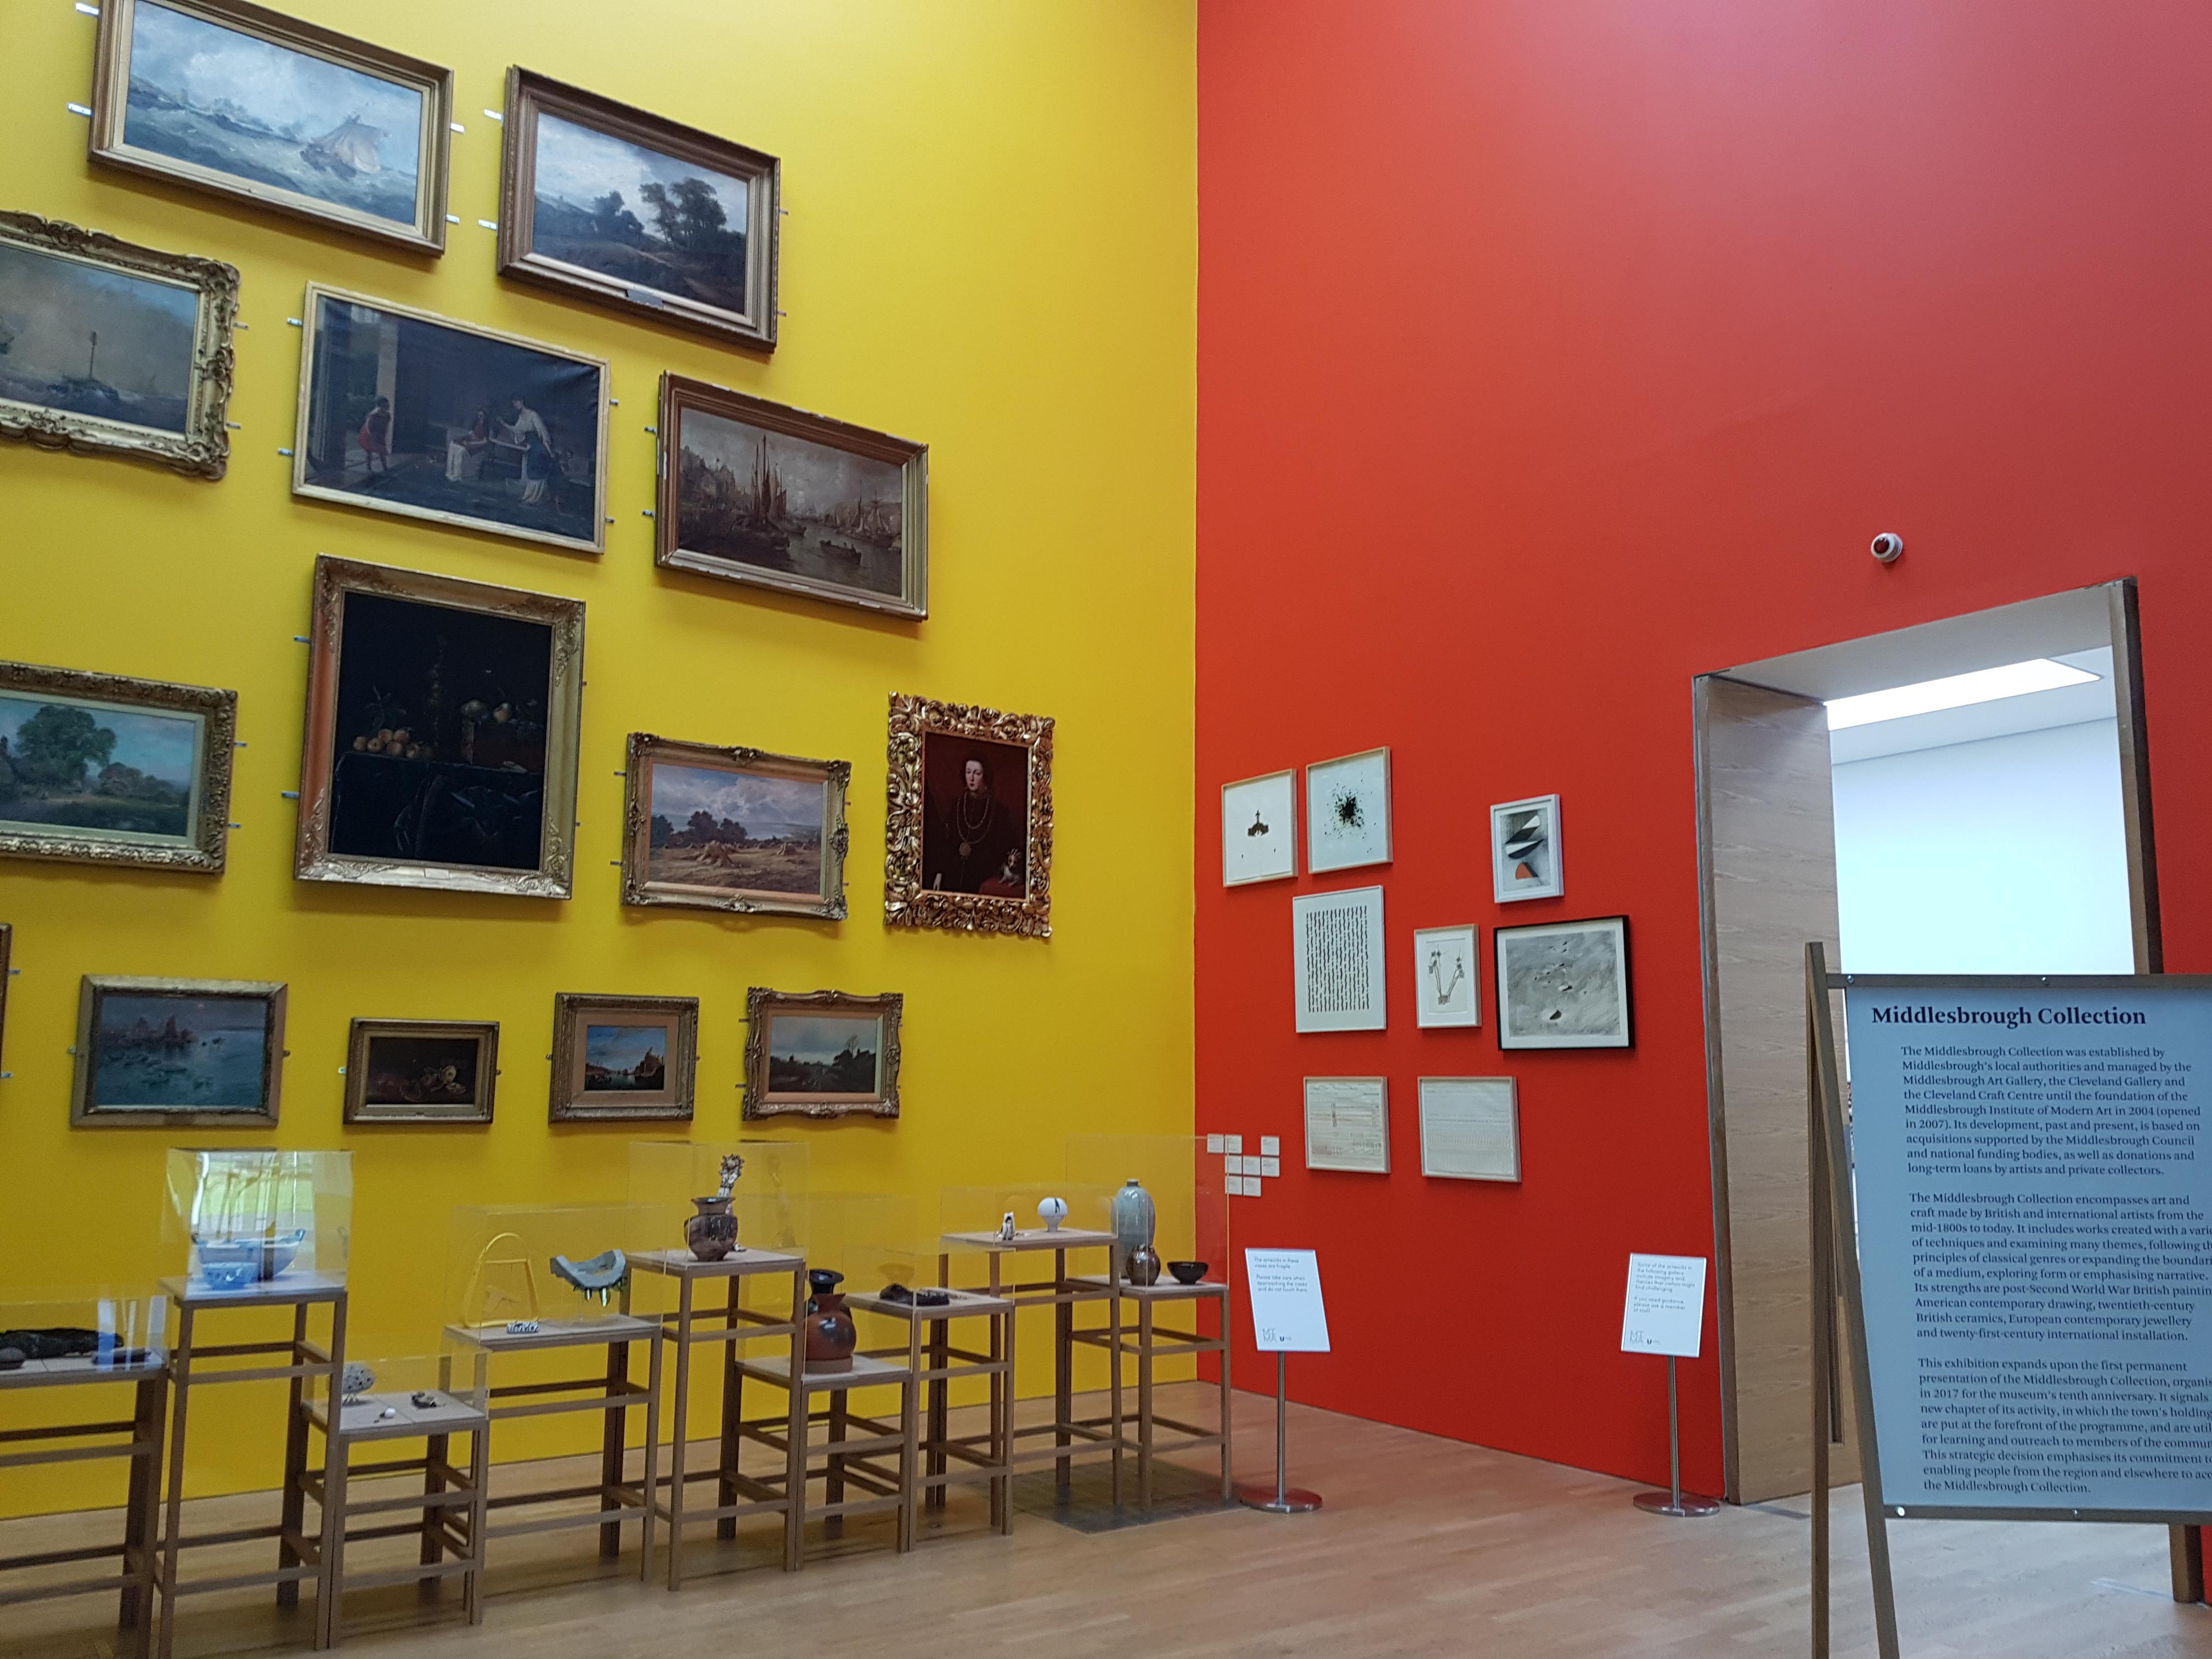 File:MIMA art gallery, Middlesbrough.jpg - Wikimedia Commons